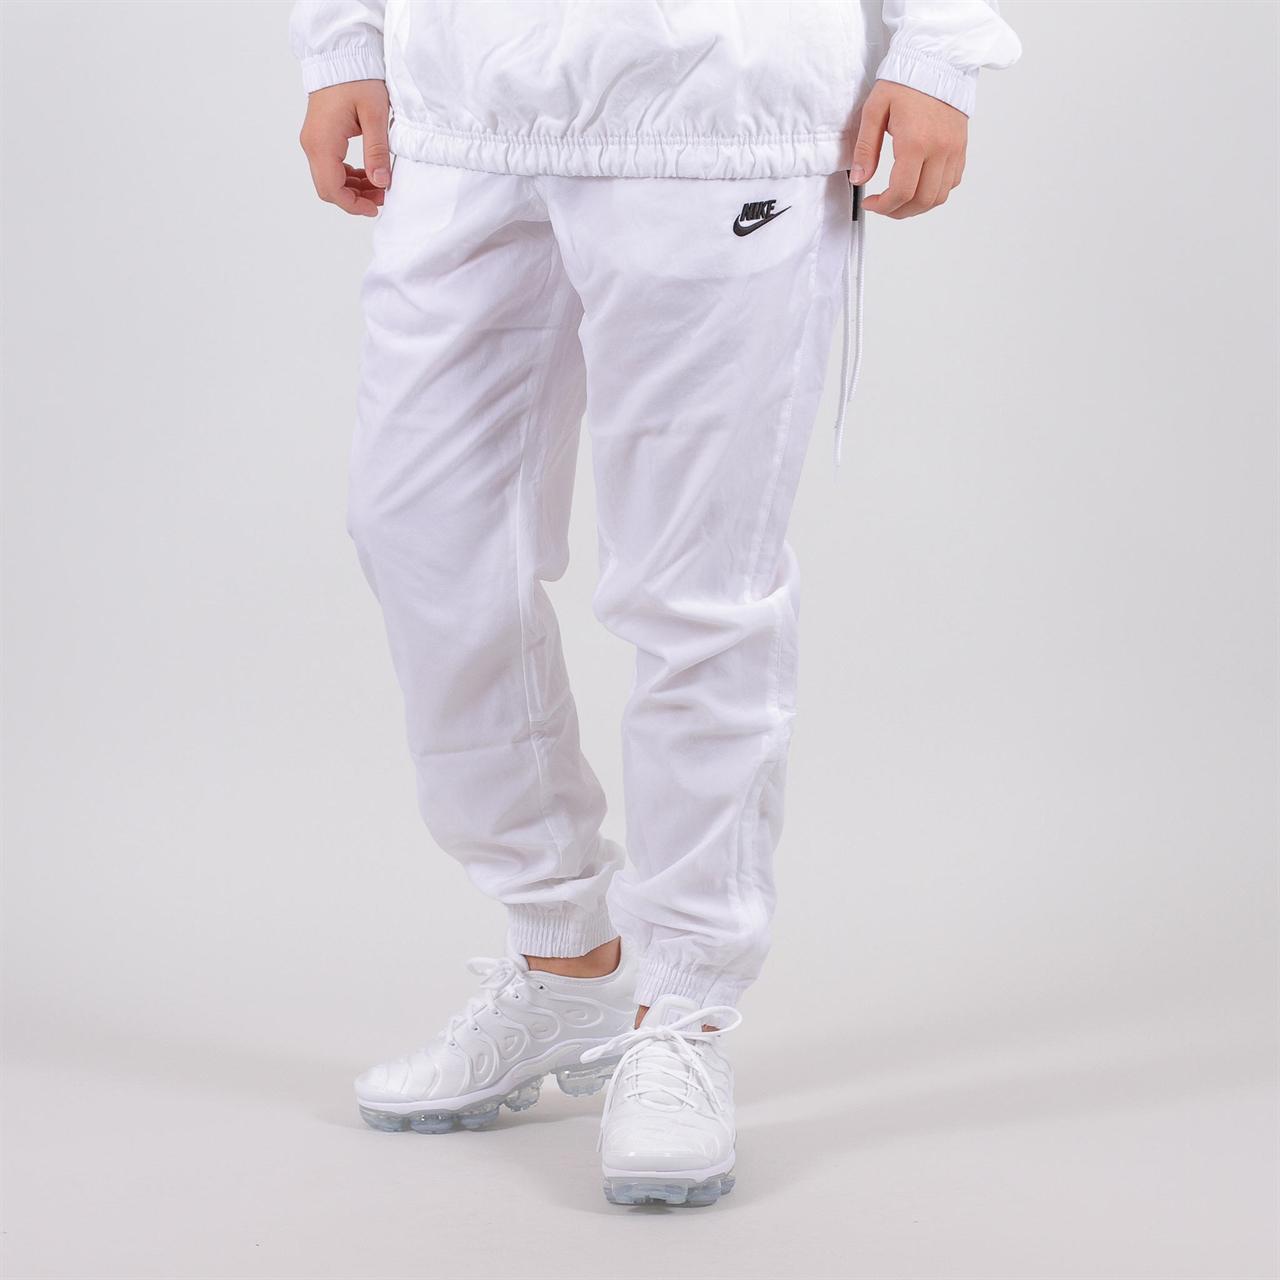 3185c8ac67dc Shelta - Nike Sportswear Woven Swoosh Pant Vaporwave (AJ2300-100)